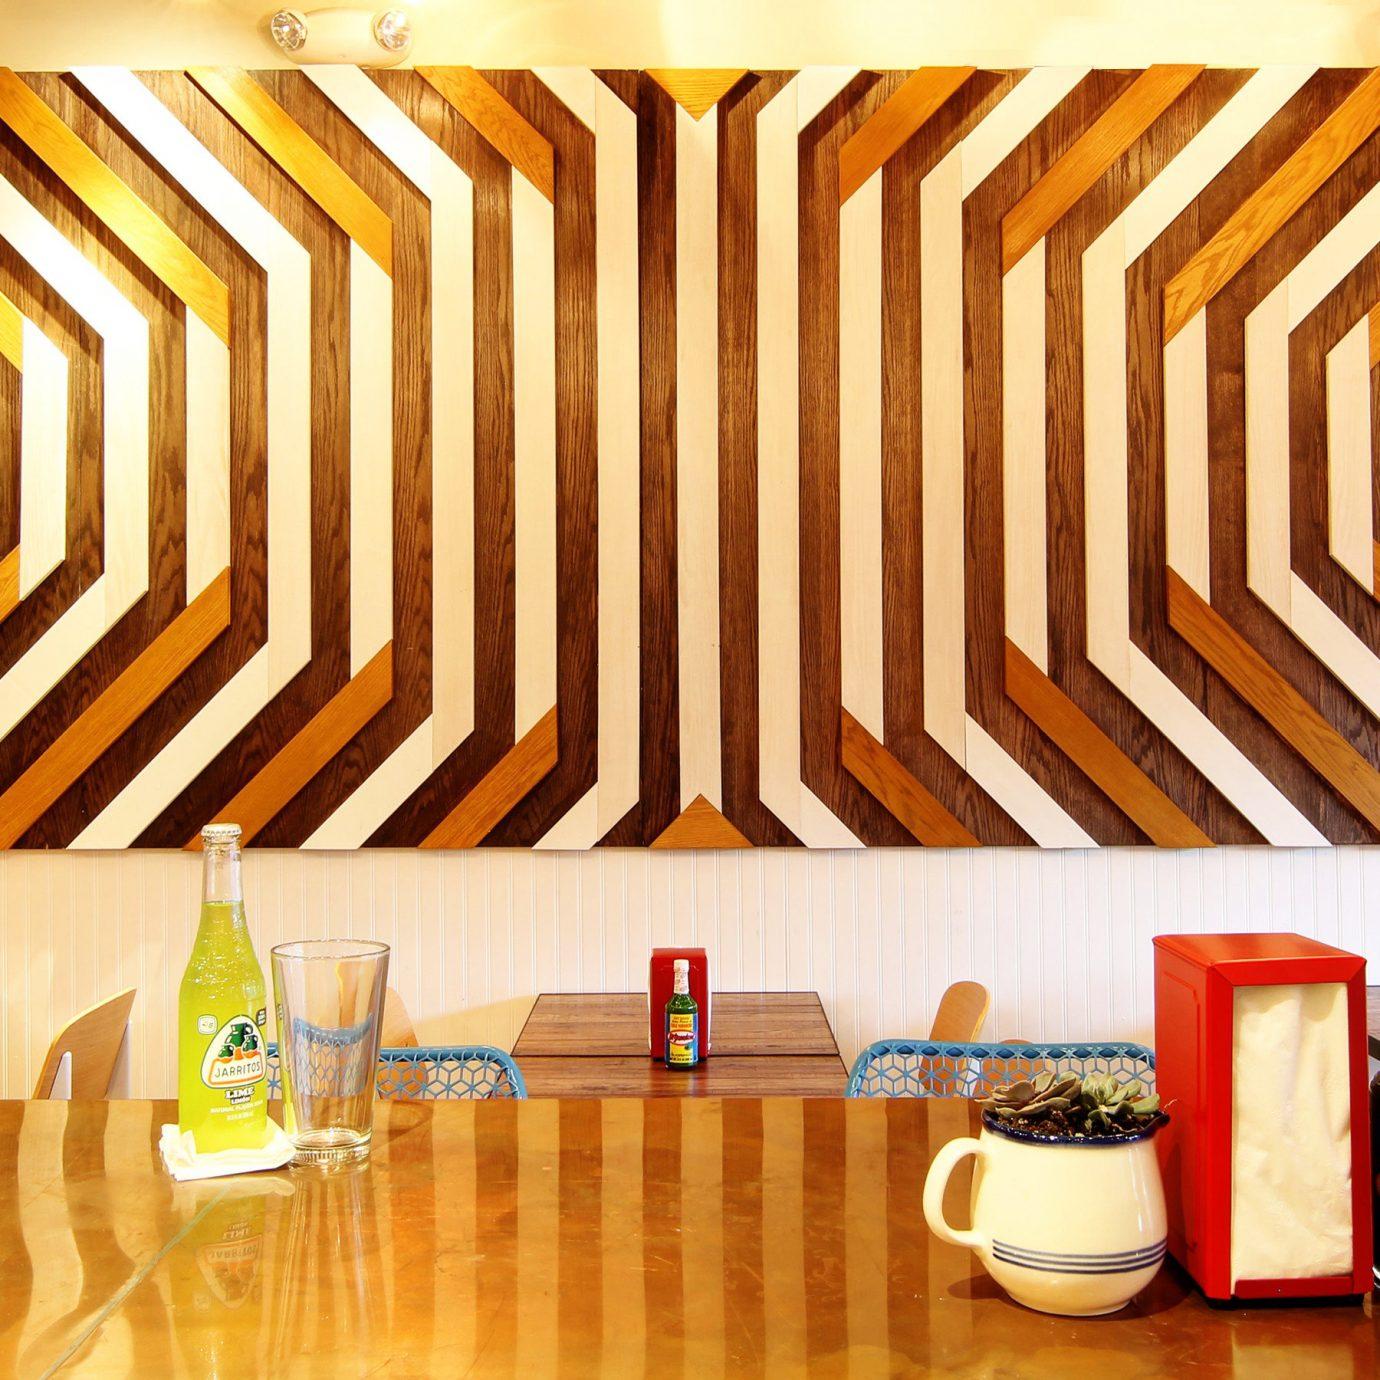 Food + Drink floor interior design Design ceiling window covering